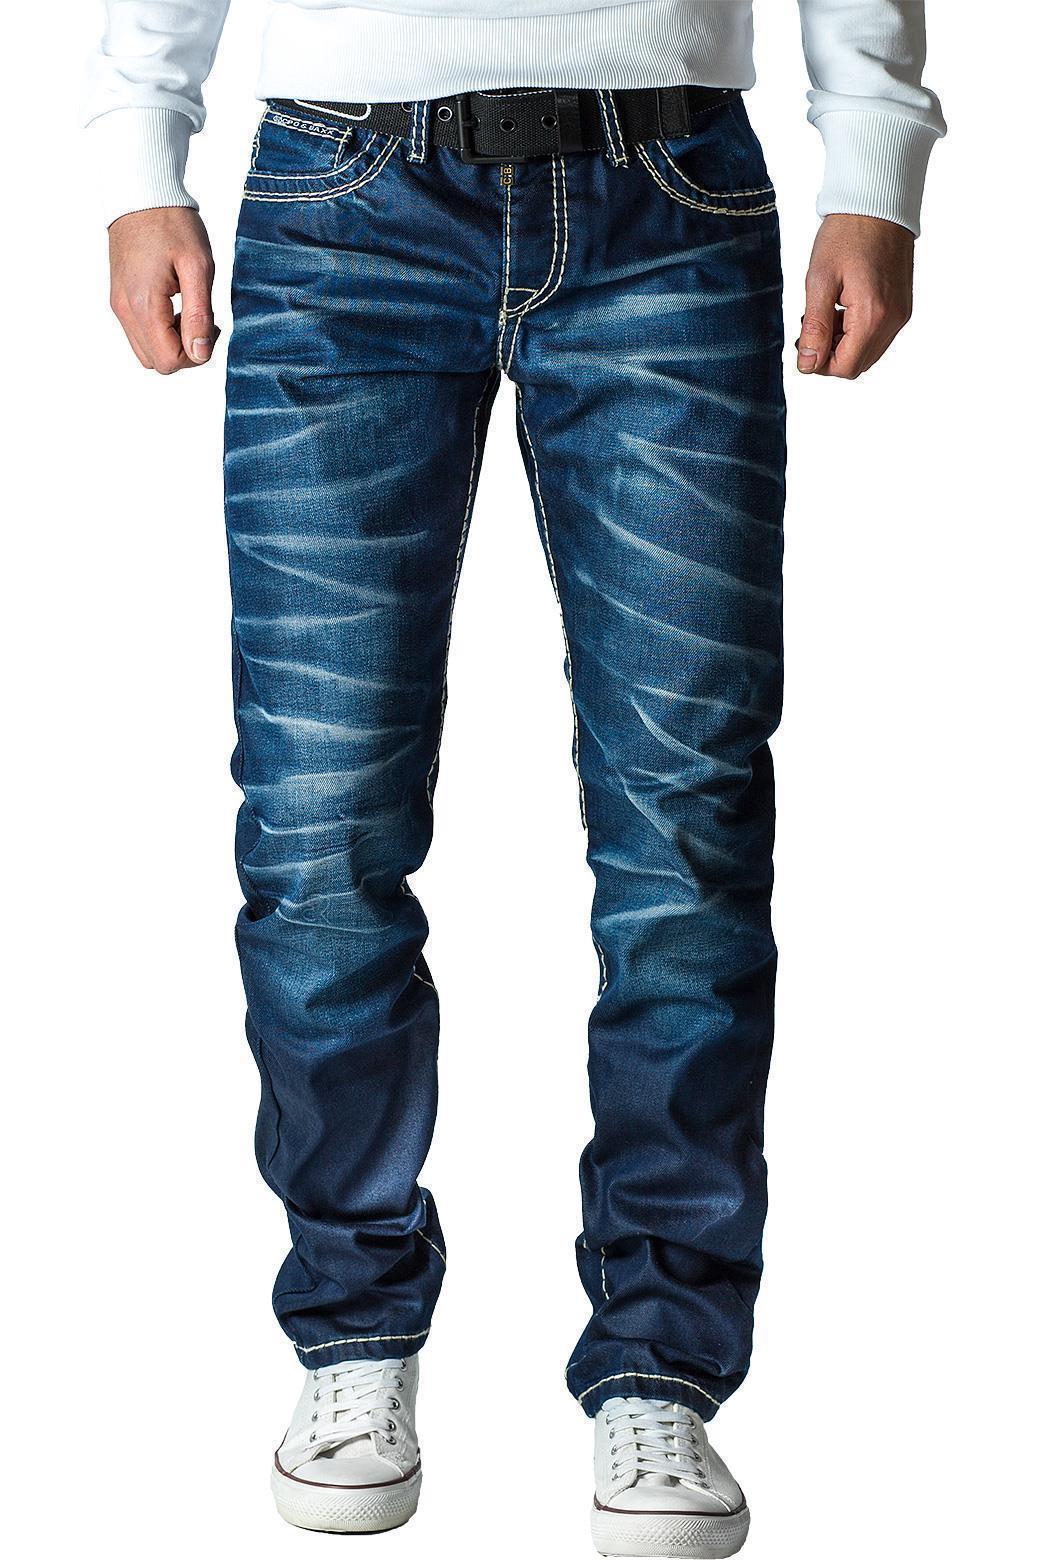 Cipo-amp-Baxx-Uomo-Jeans-Pantaloni-ricamate-Biker-Style-streetwear-nervature-pattern-Dope miniatura 14